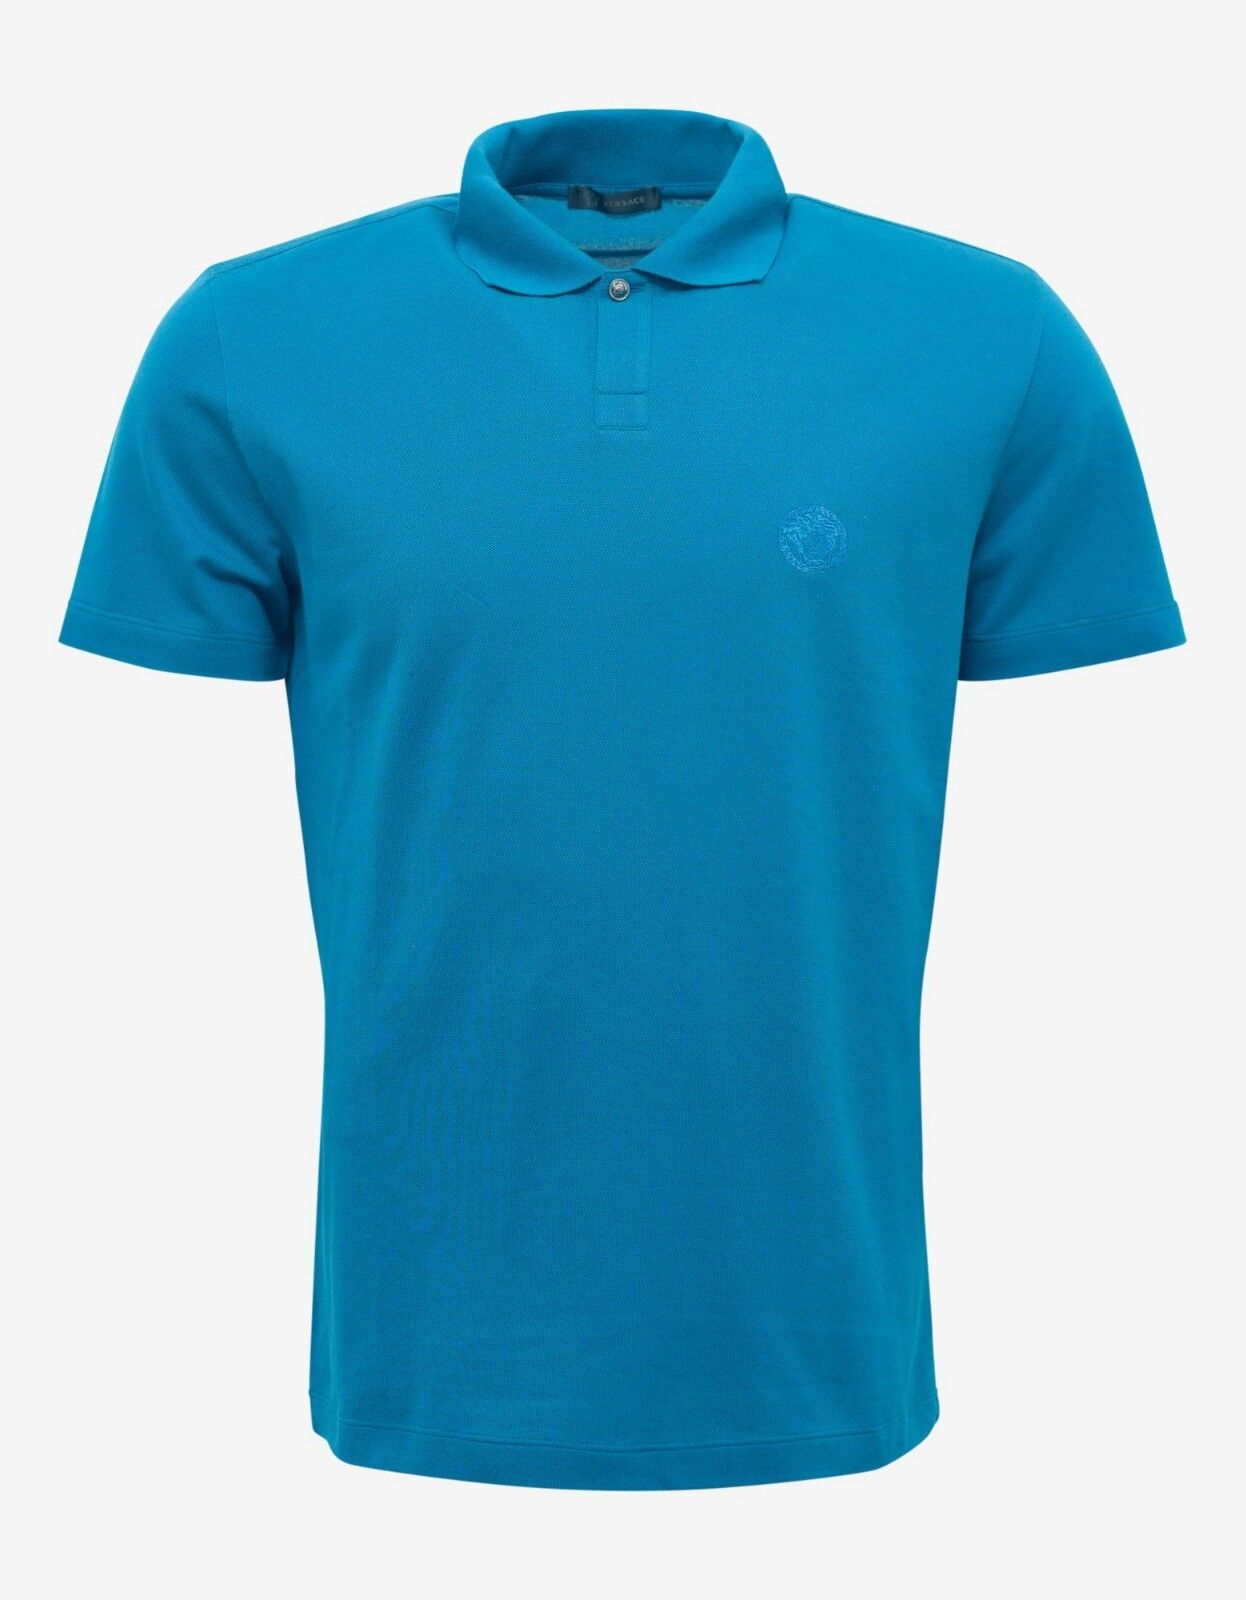 New VERSACE Teal Blue Medusa Crest Polo T-Shirt BNWT RRP £340